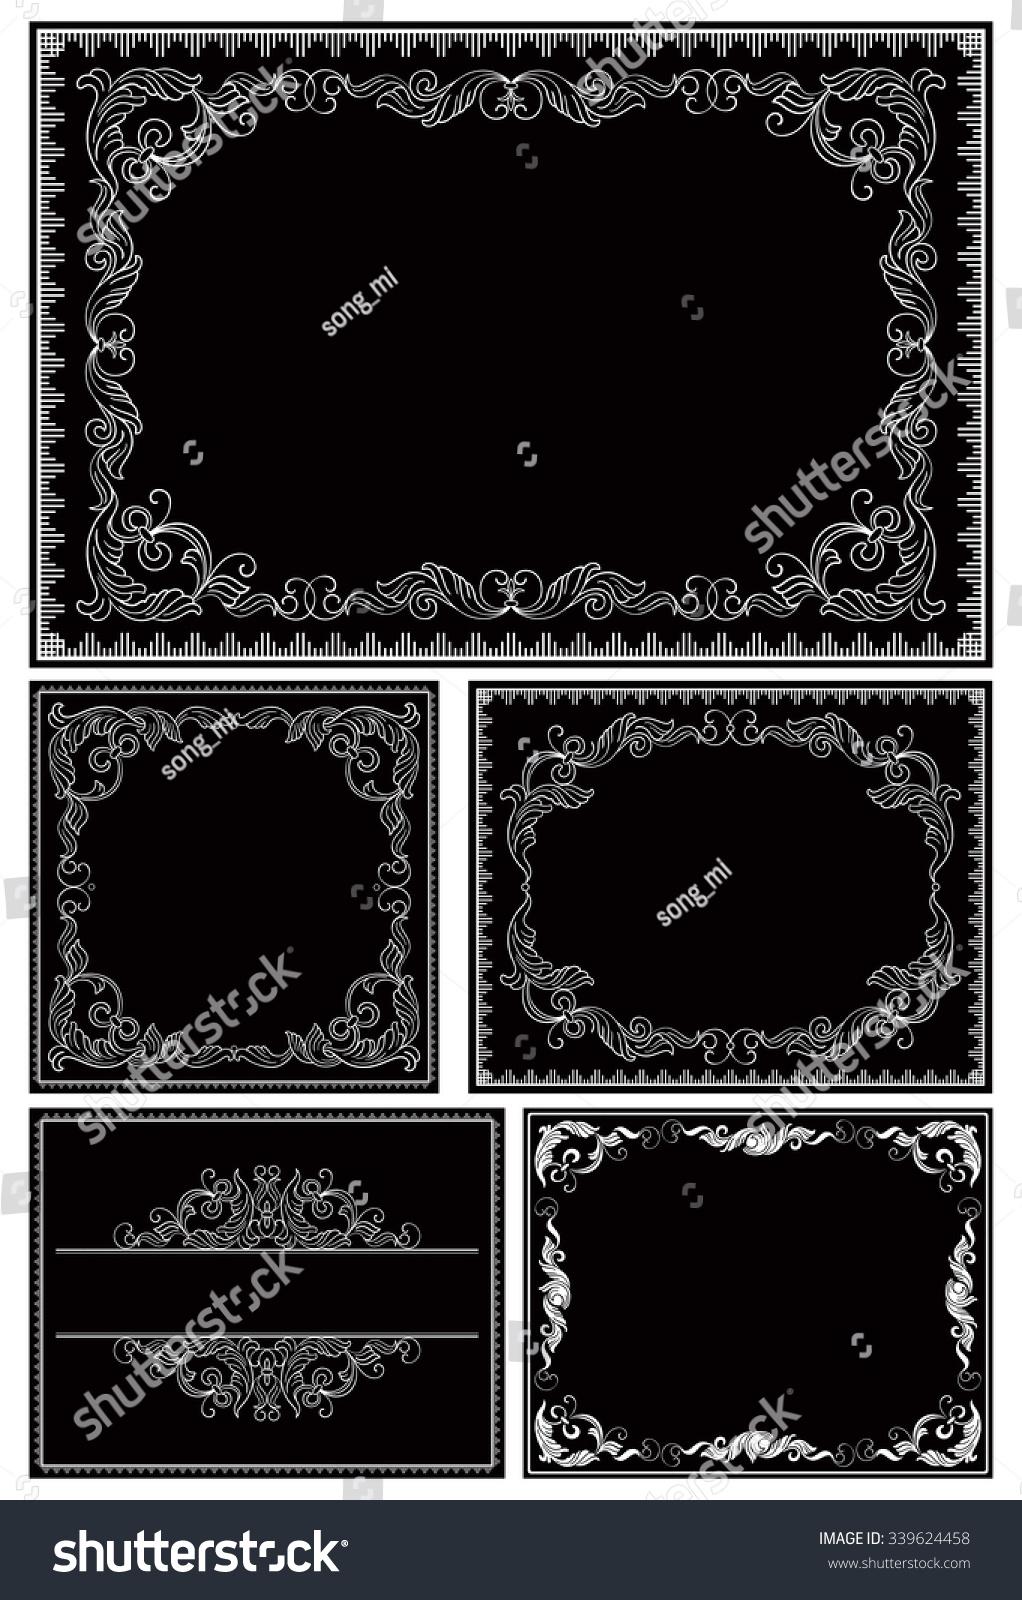 Vintage Ornate Borders Vector Set Frames Stock Vector HD (Royalty ...